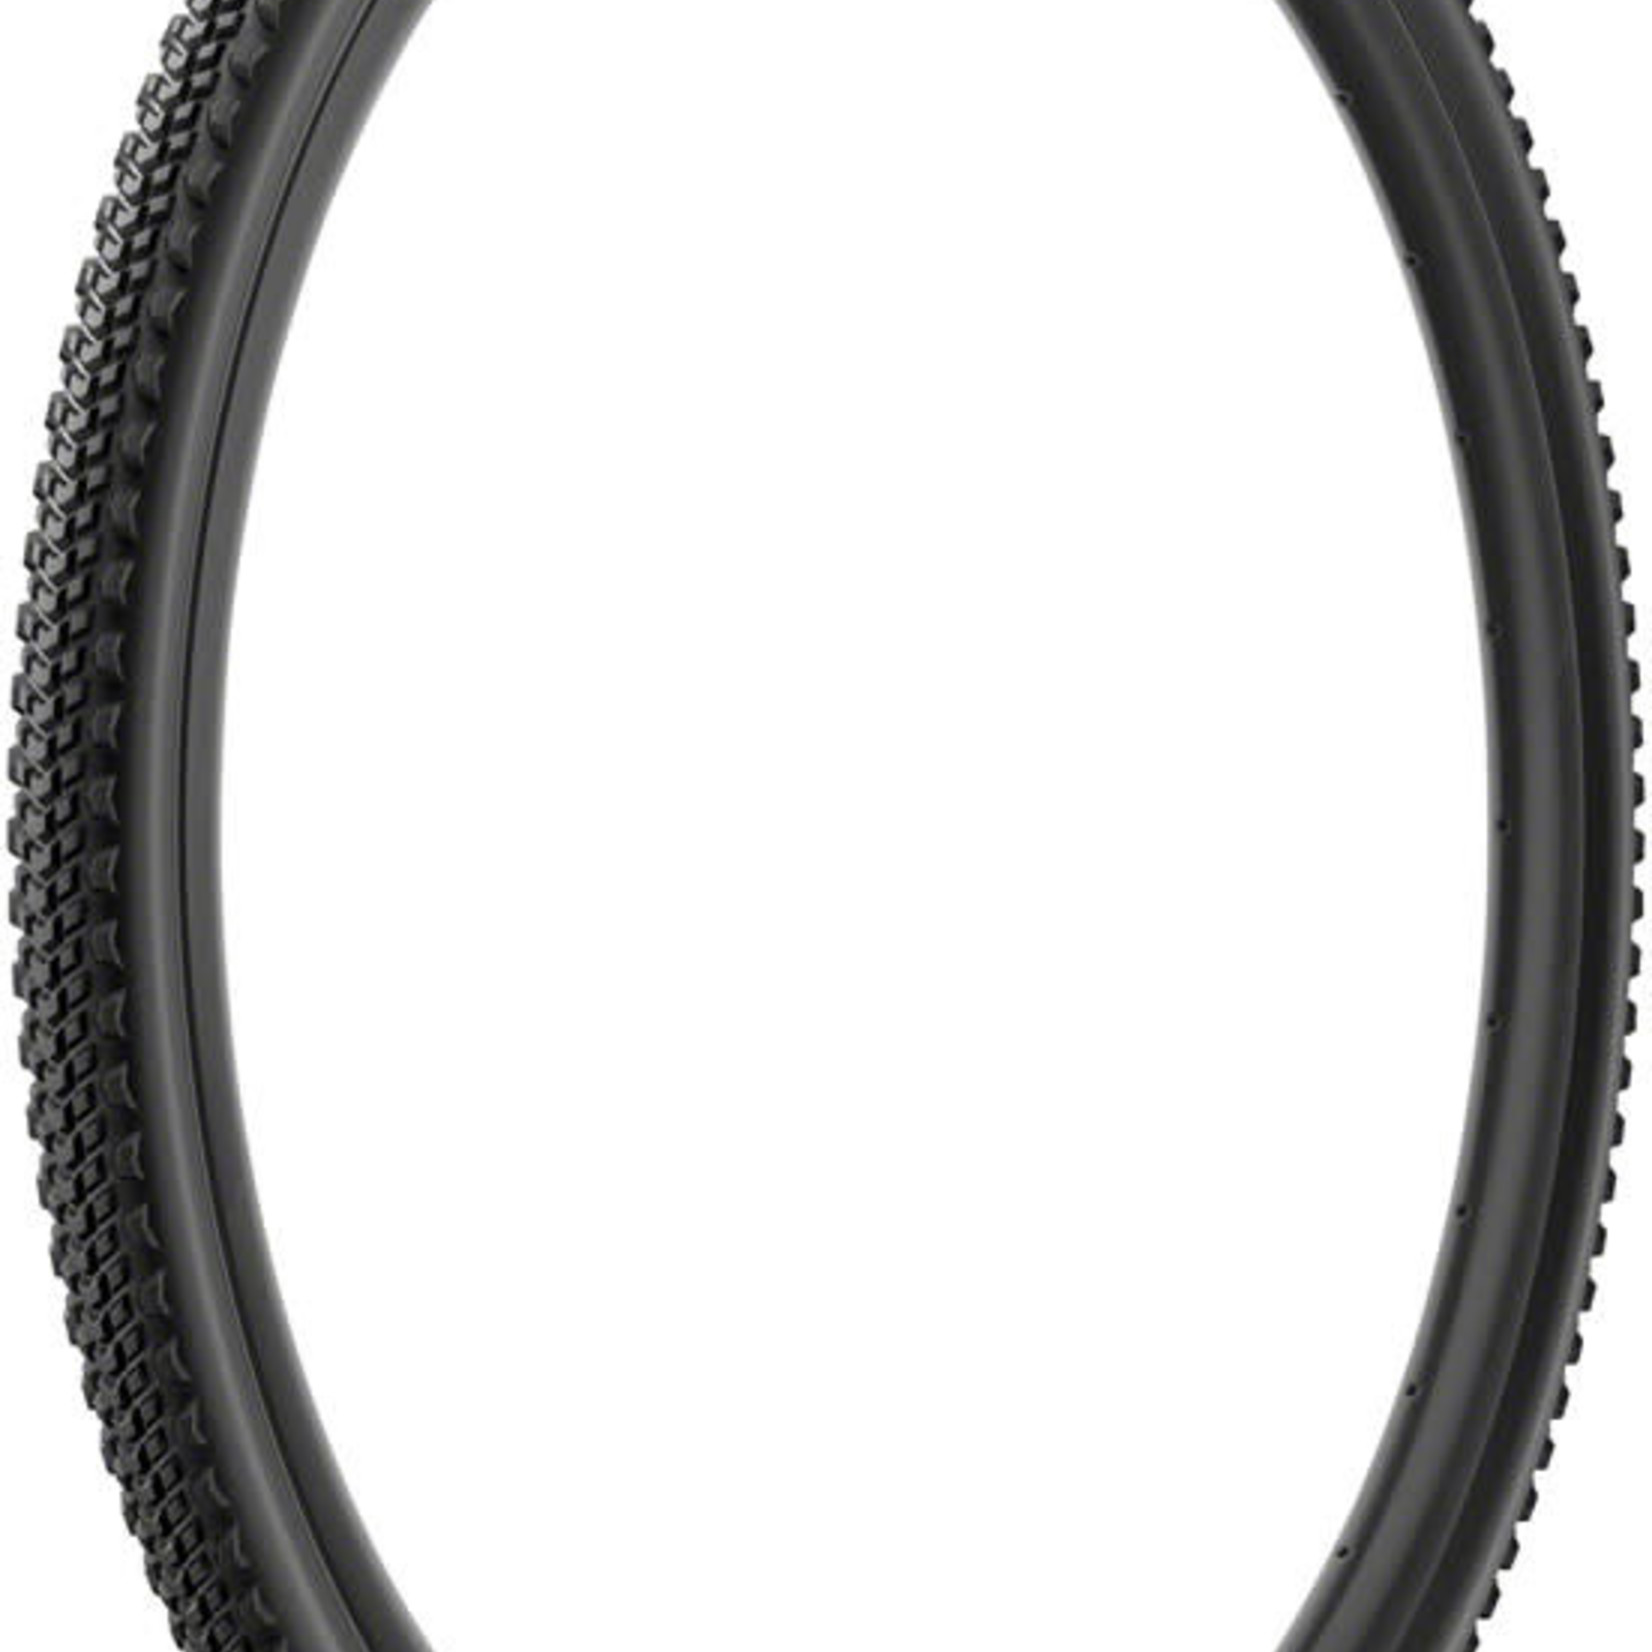 Pirelli Pirelli Cinturato Cross H Tire - 700 x 33, Tubeless, Folding, Black